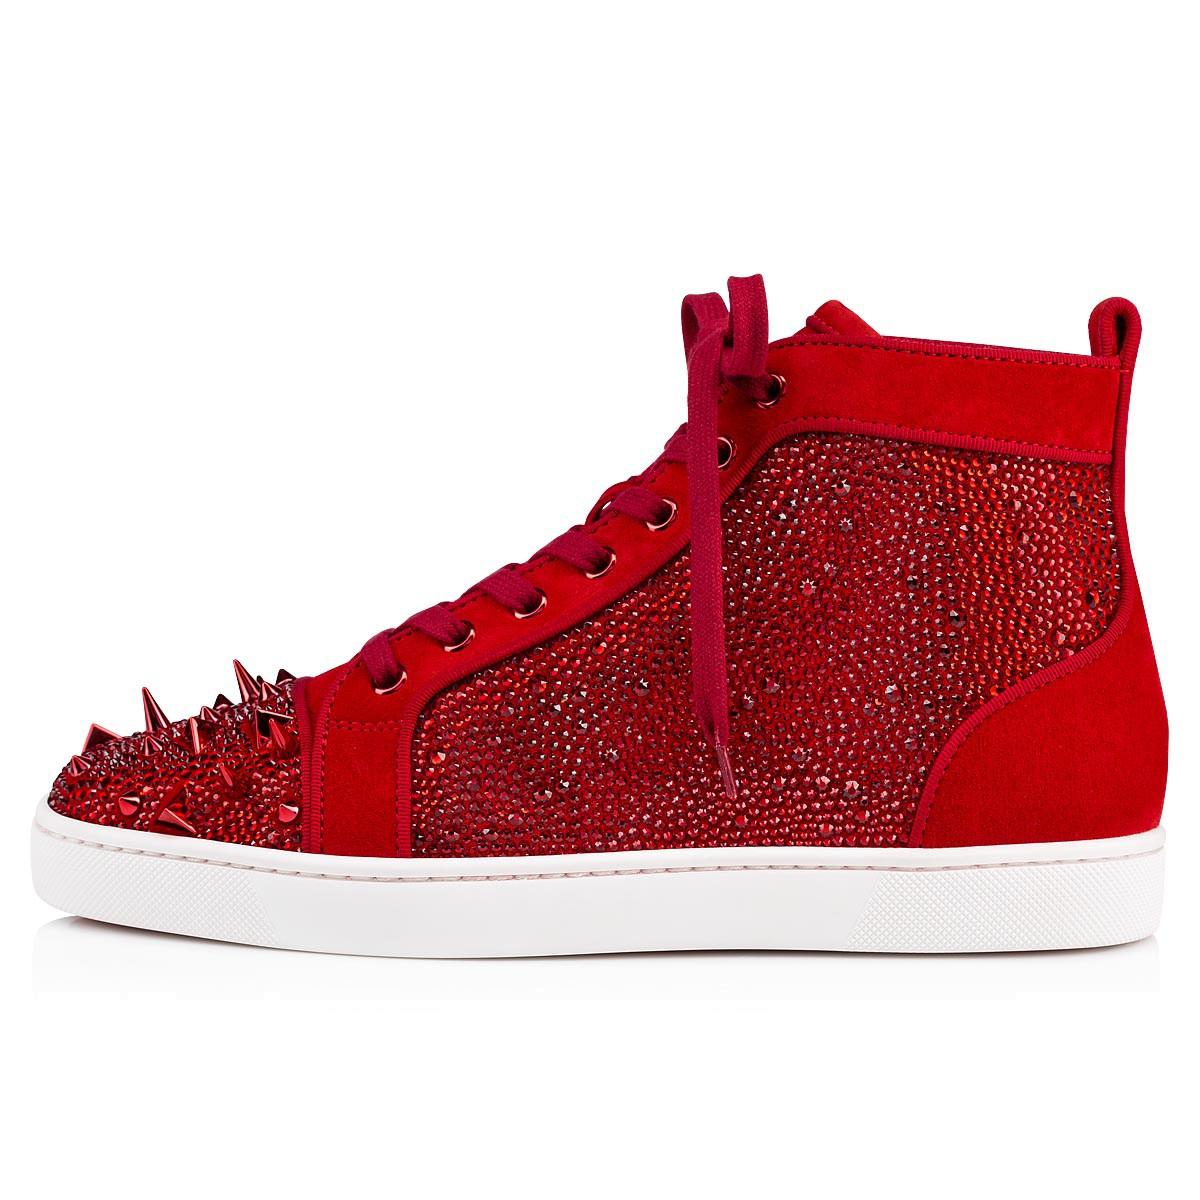 Shoes - Lou Pik Pik Strass Orlato Flat - Christian Louboutin